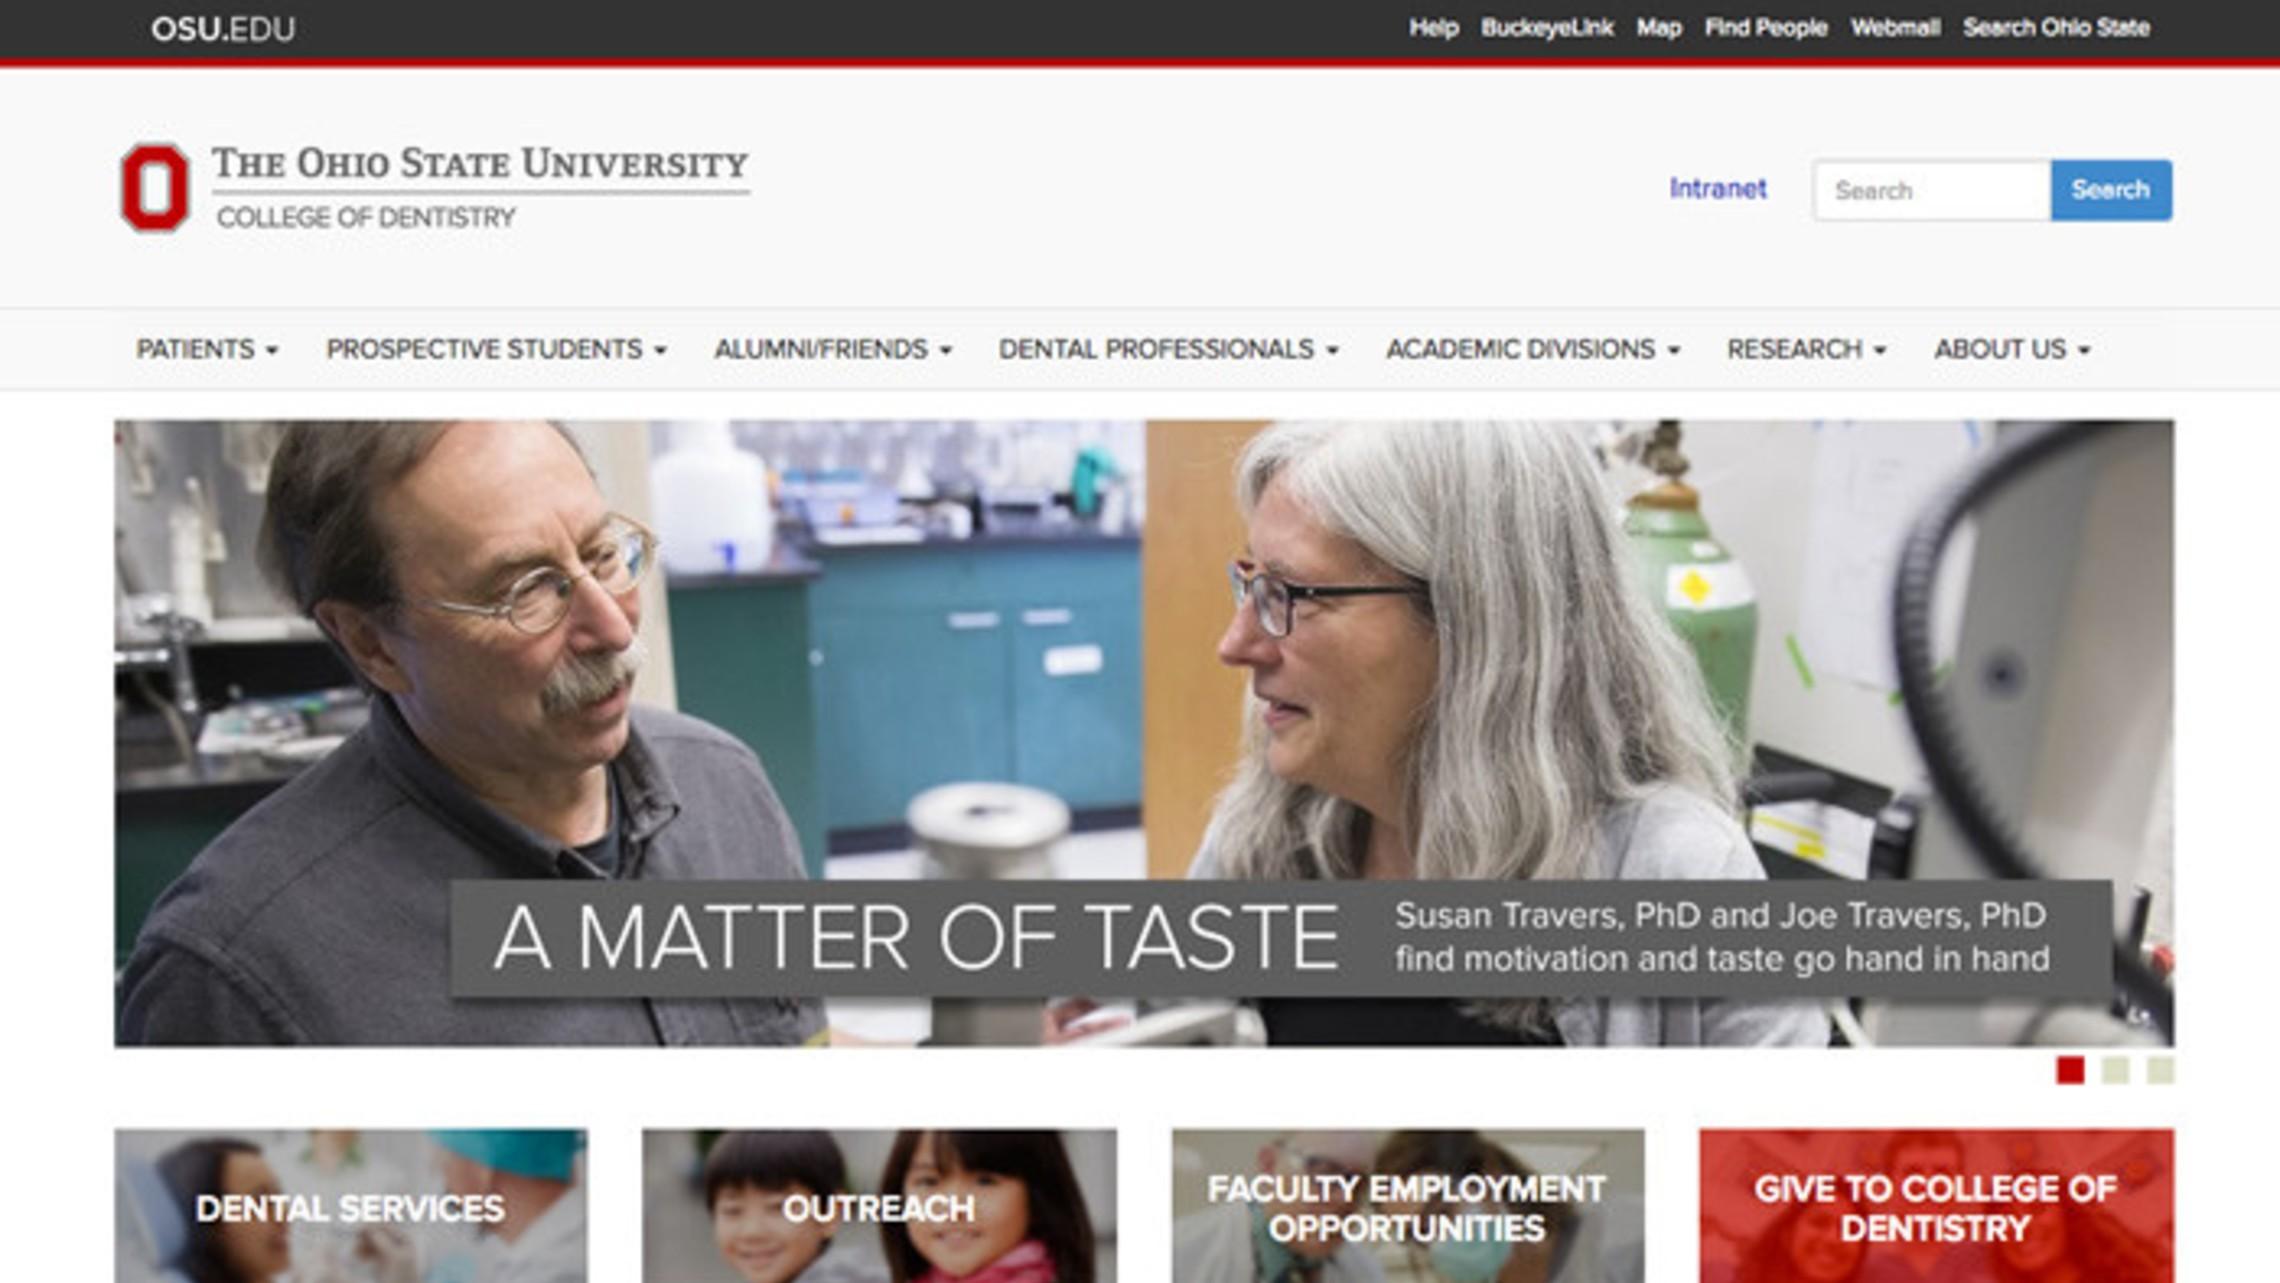 OSU - College of Dentistry